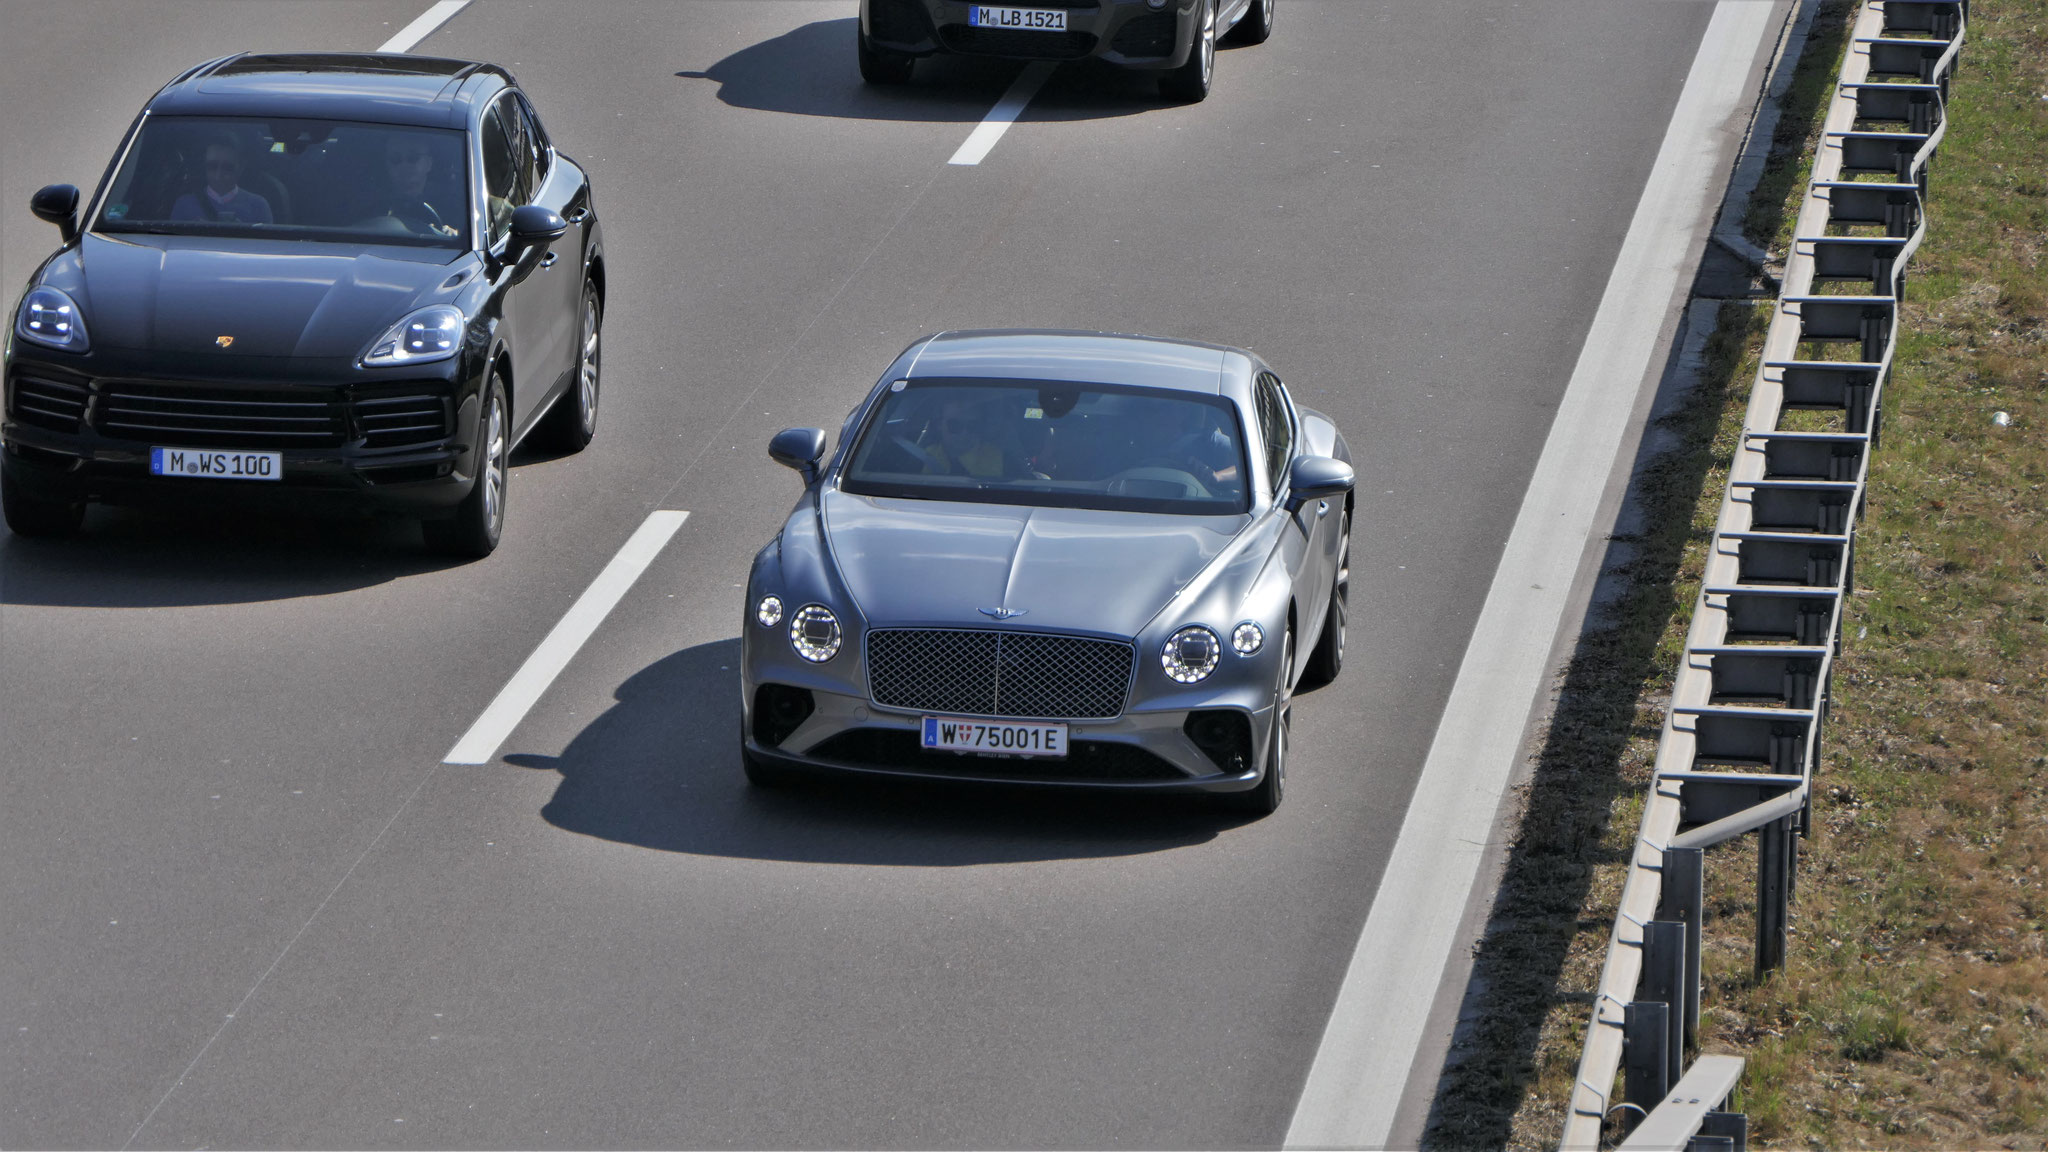 Bentley Continental GT - W-75001E (AUT)